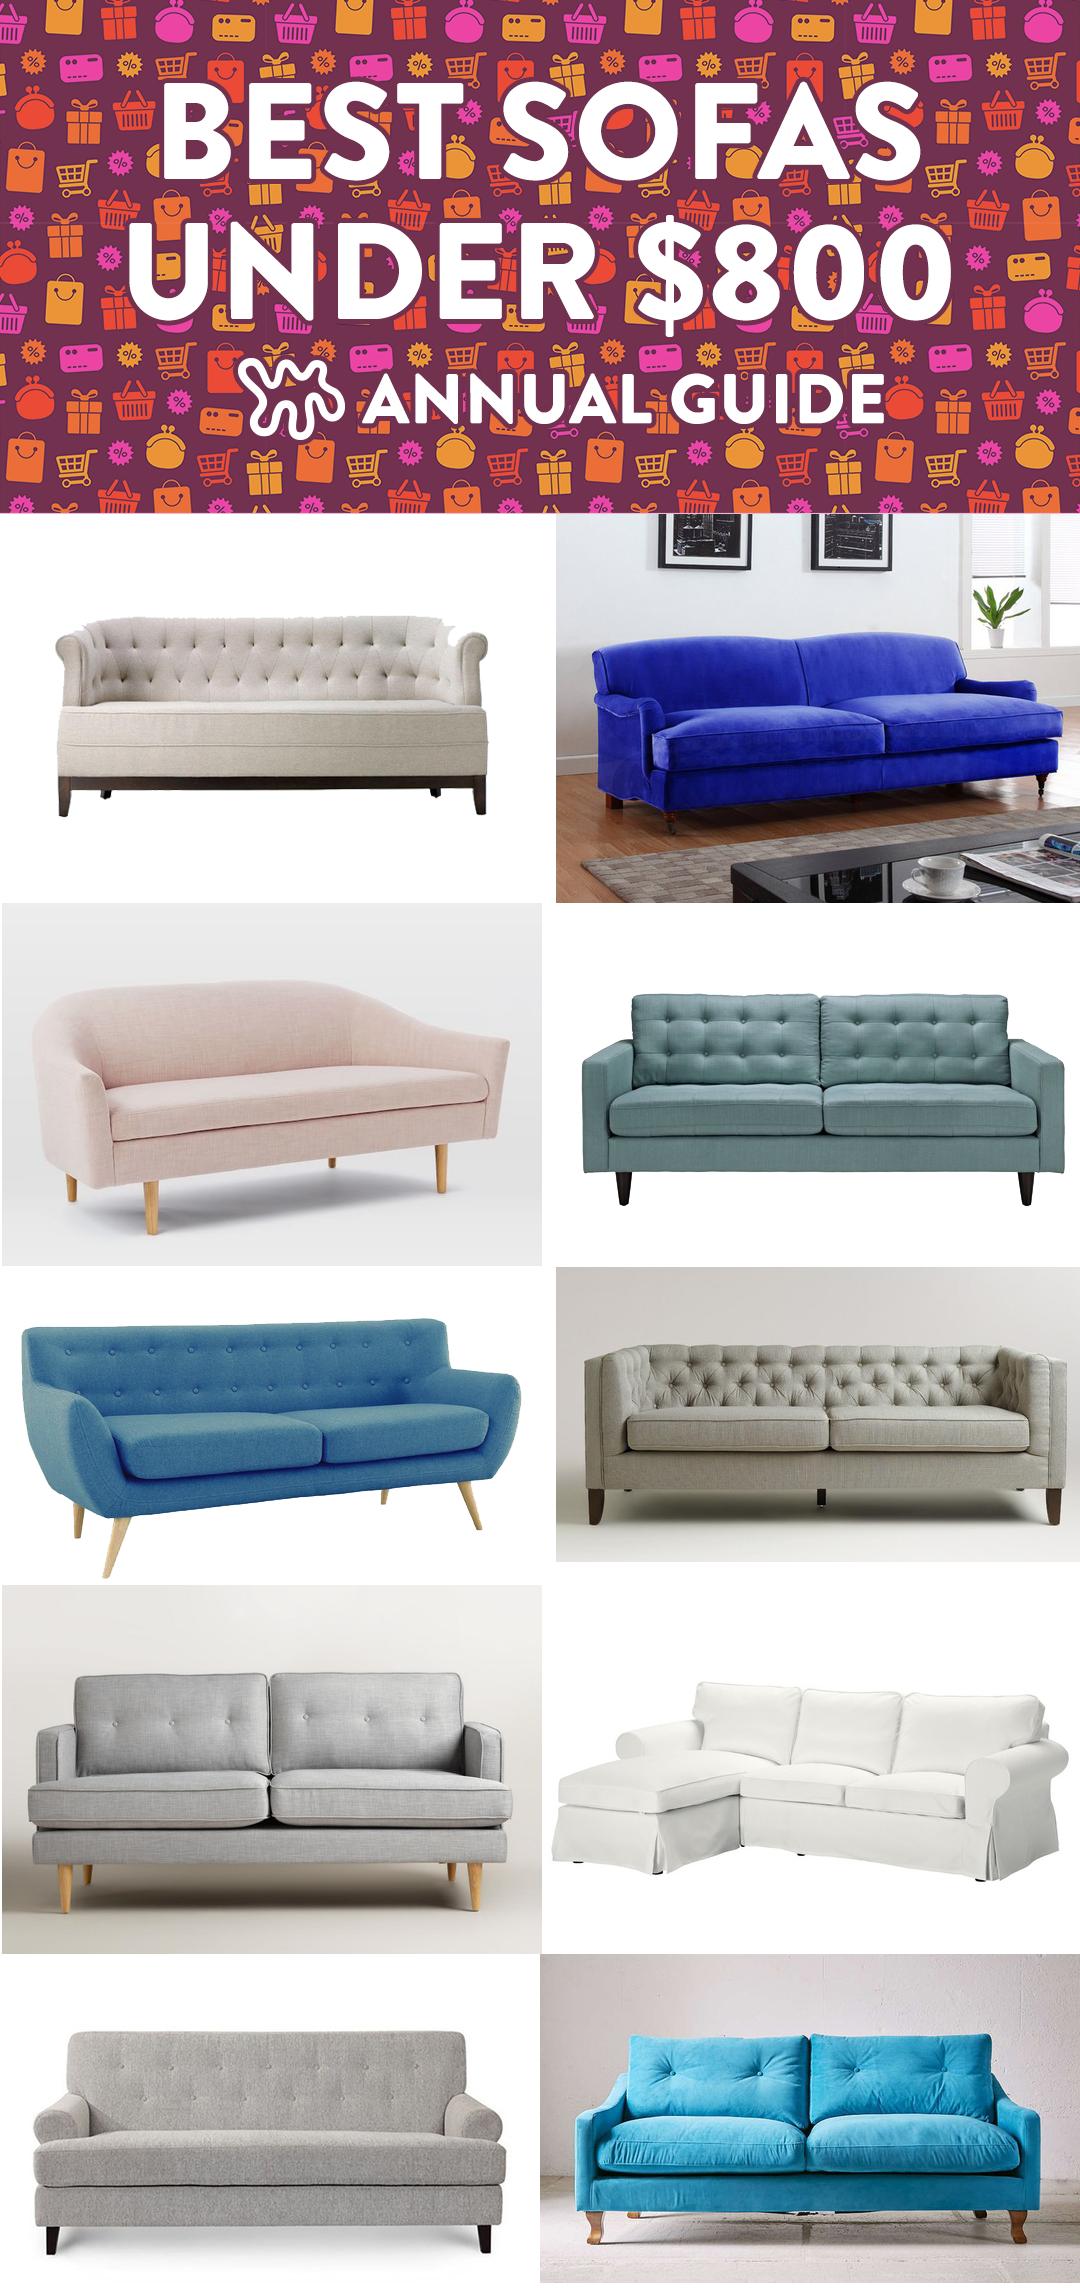 Top 10 The Best Sofas Under 800 Best sofa, Budget sofa